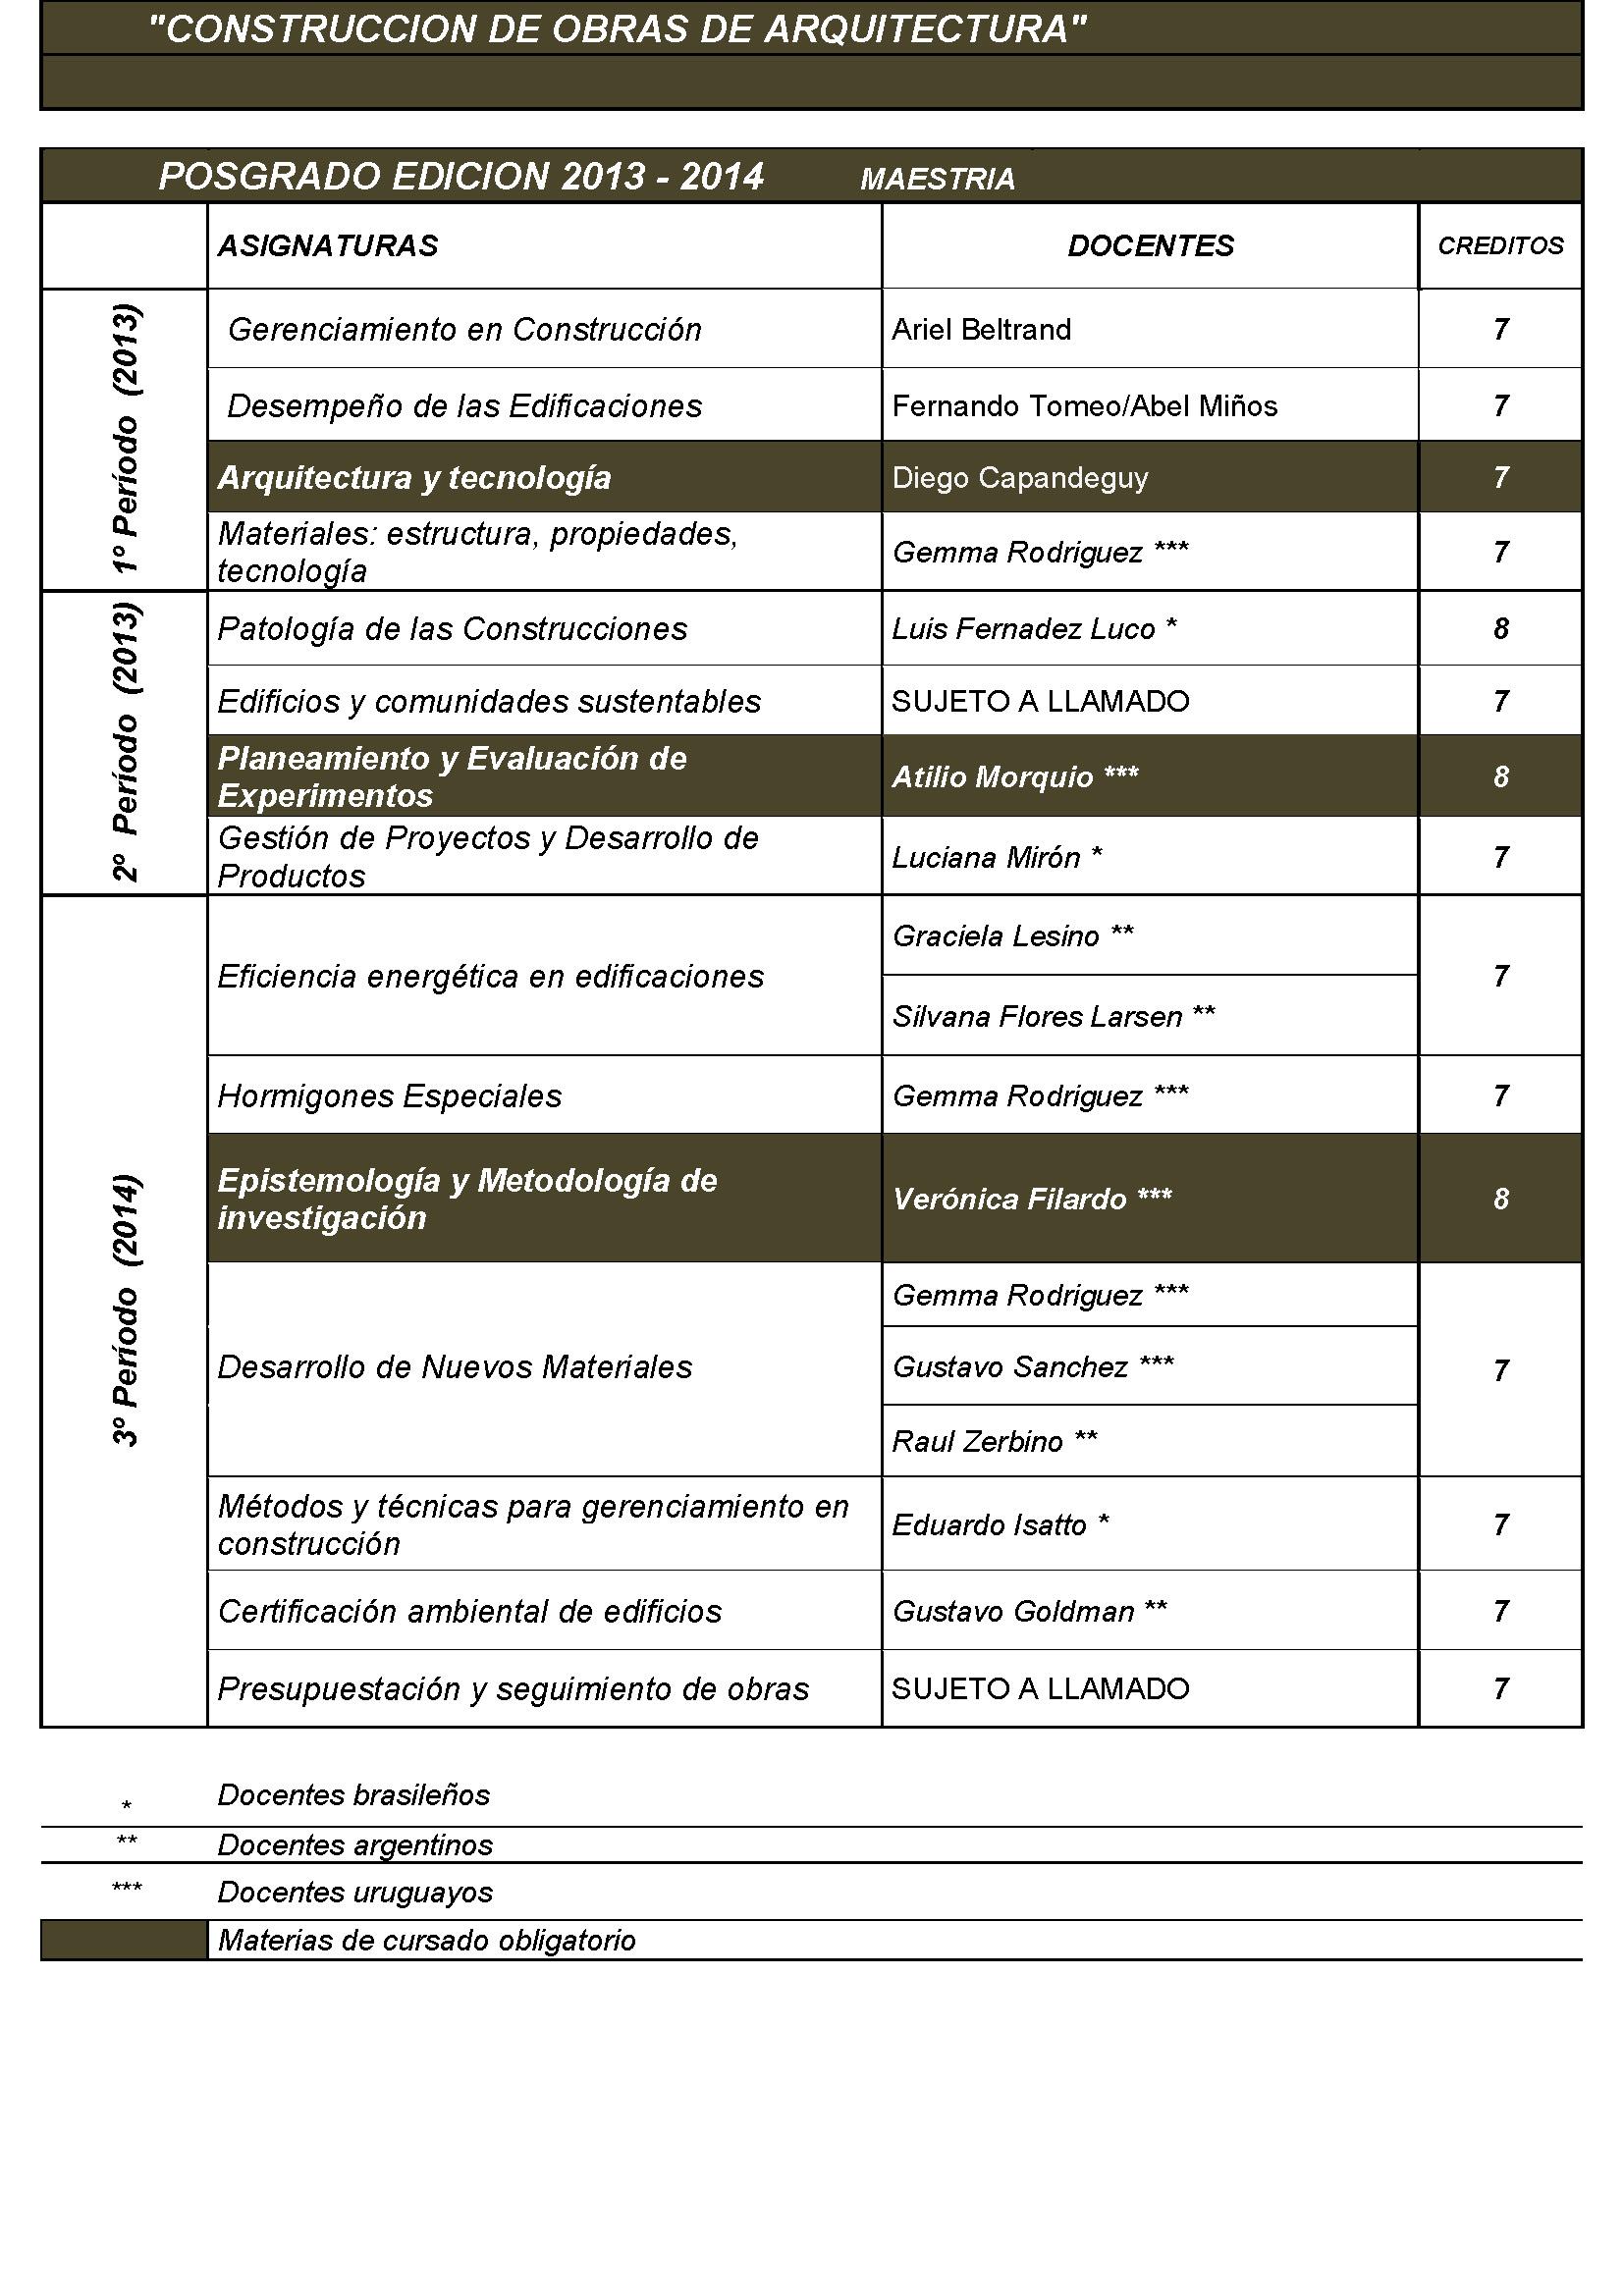 Cuadro de asignaturas maestr a maestr a y diploma en for Arquitectura materias